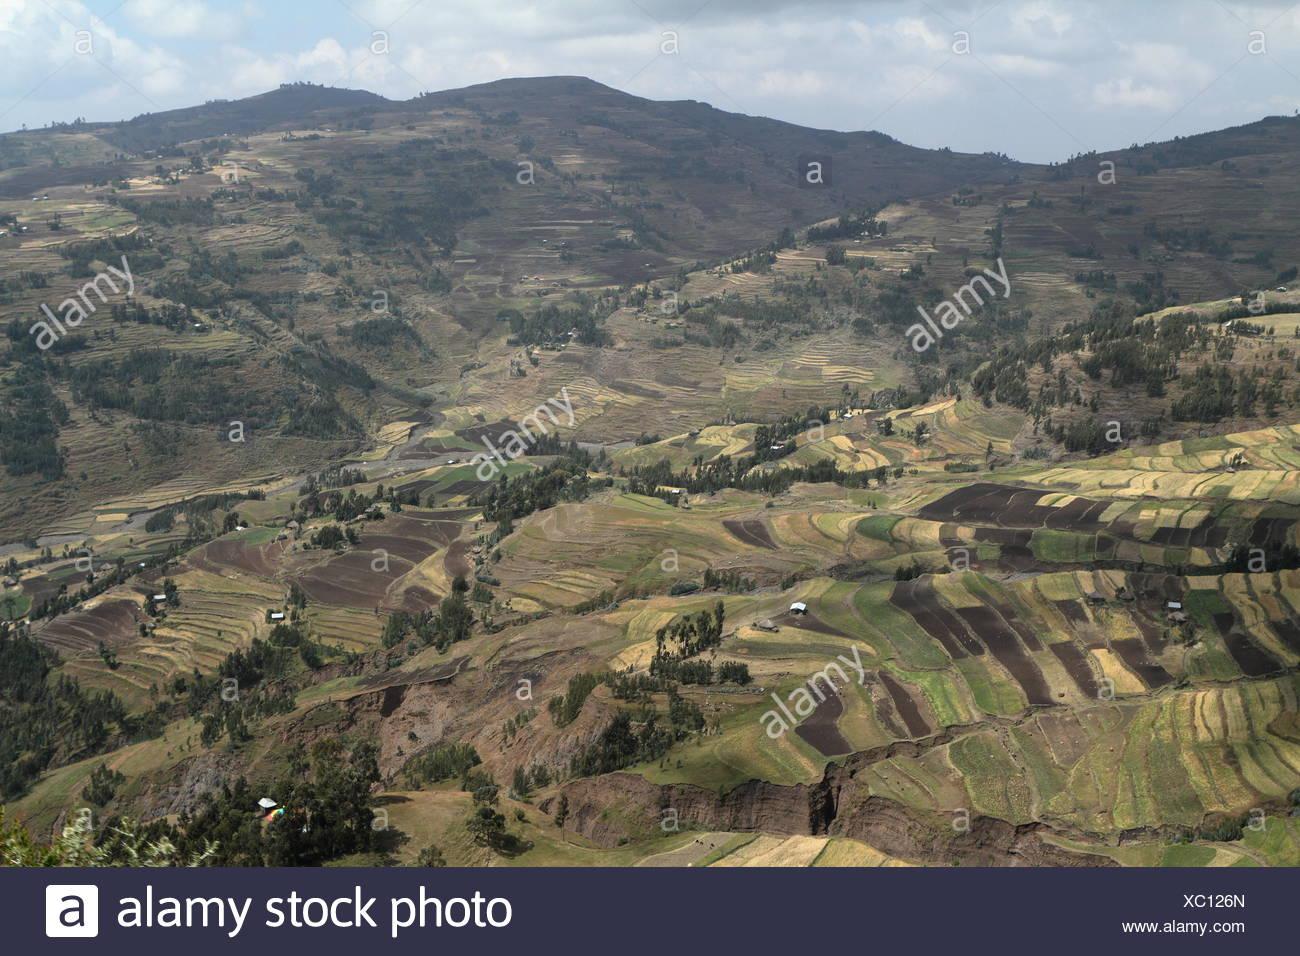 the landscape at lalibella in ethiopia - Stock Image